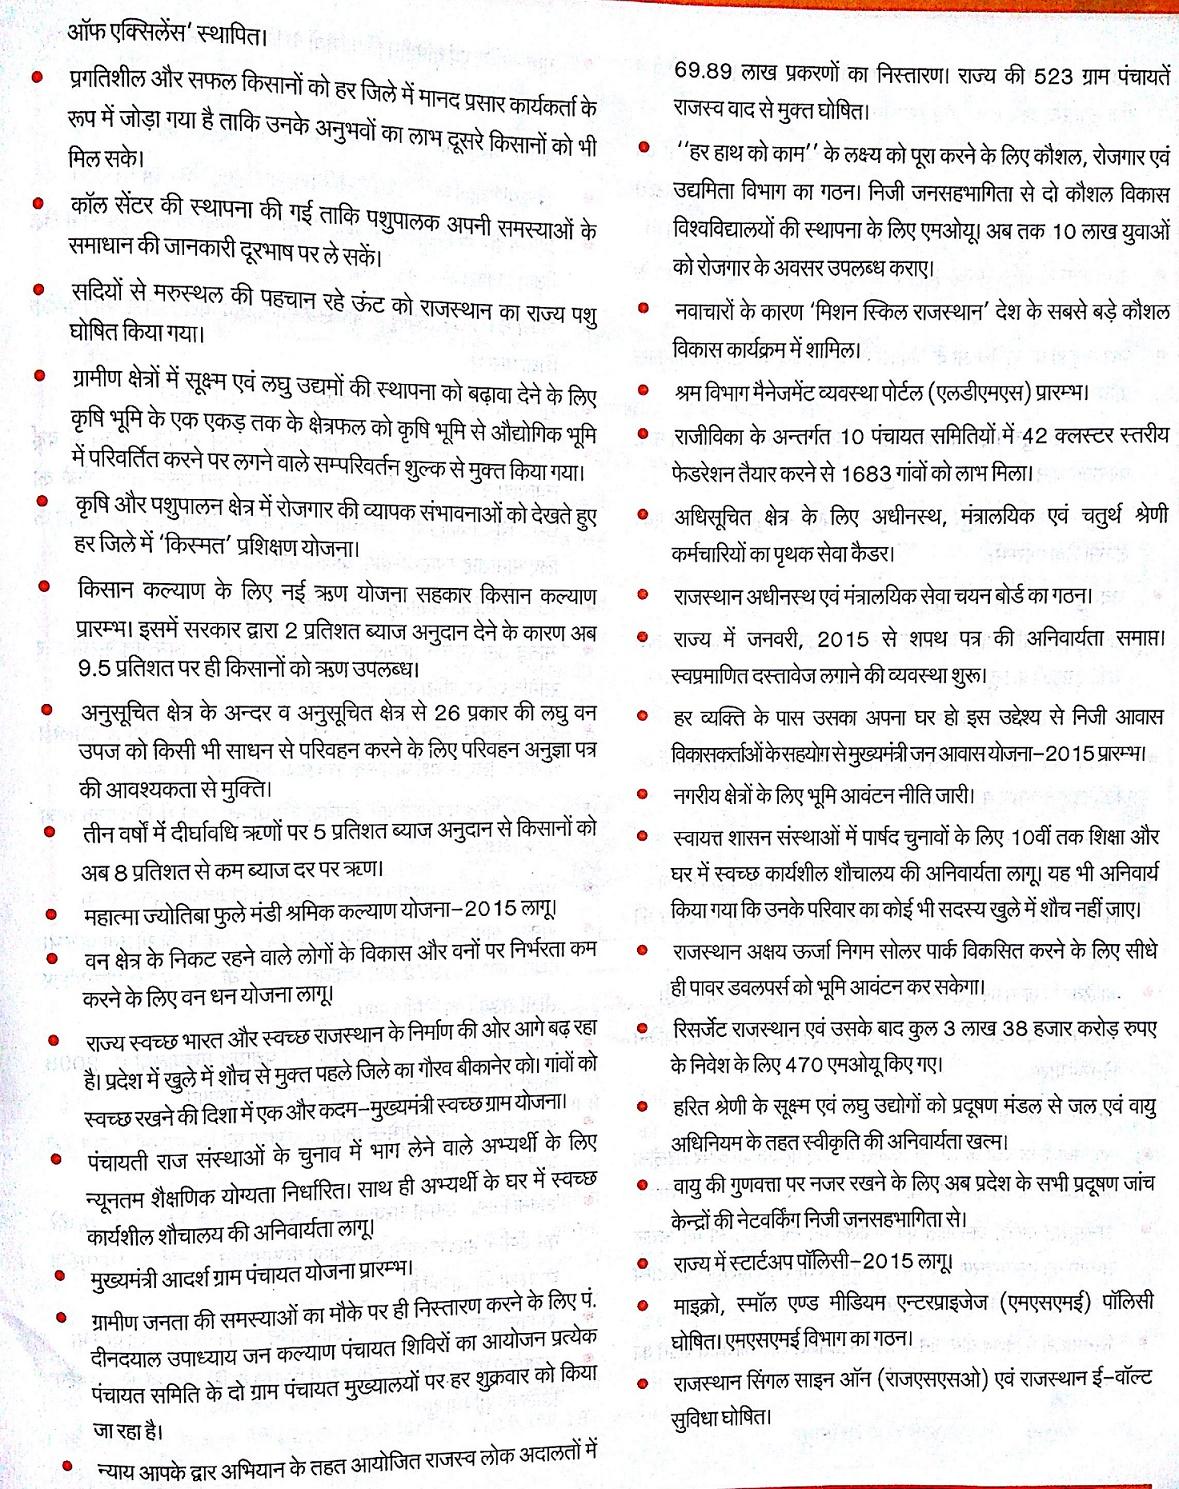 Pdf Book Of Rajasthan Gk